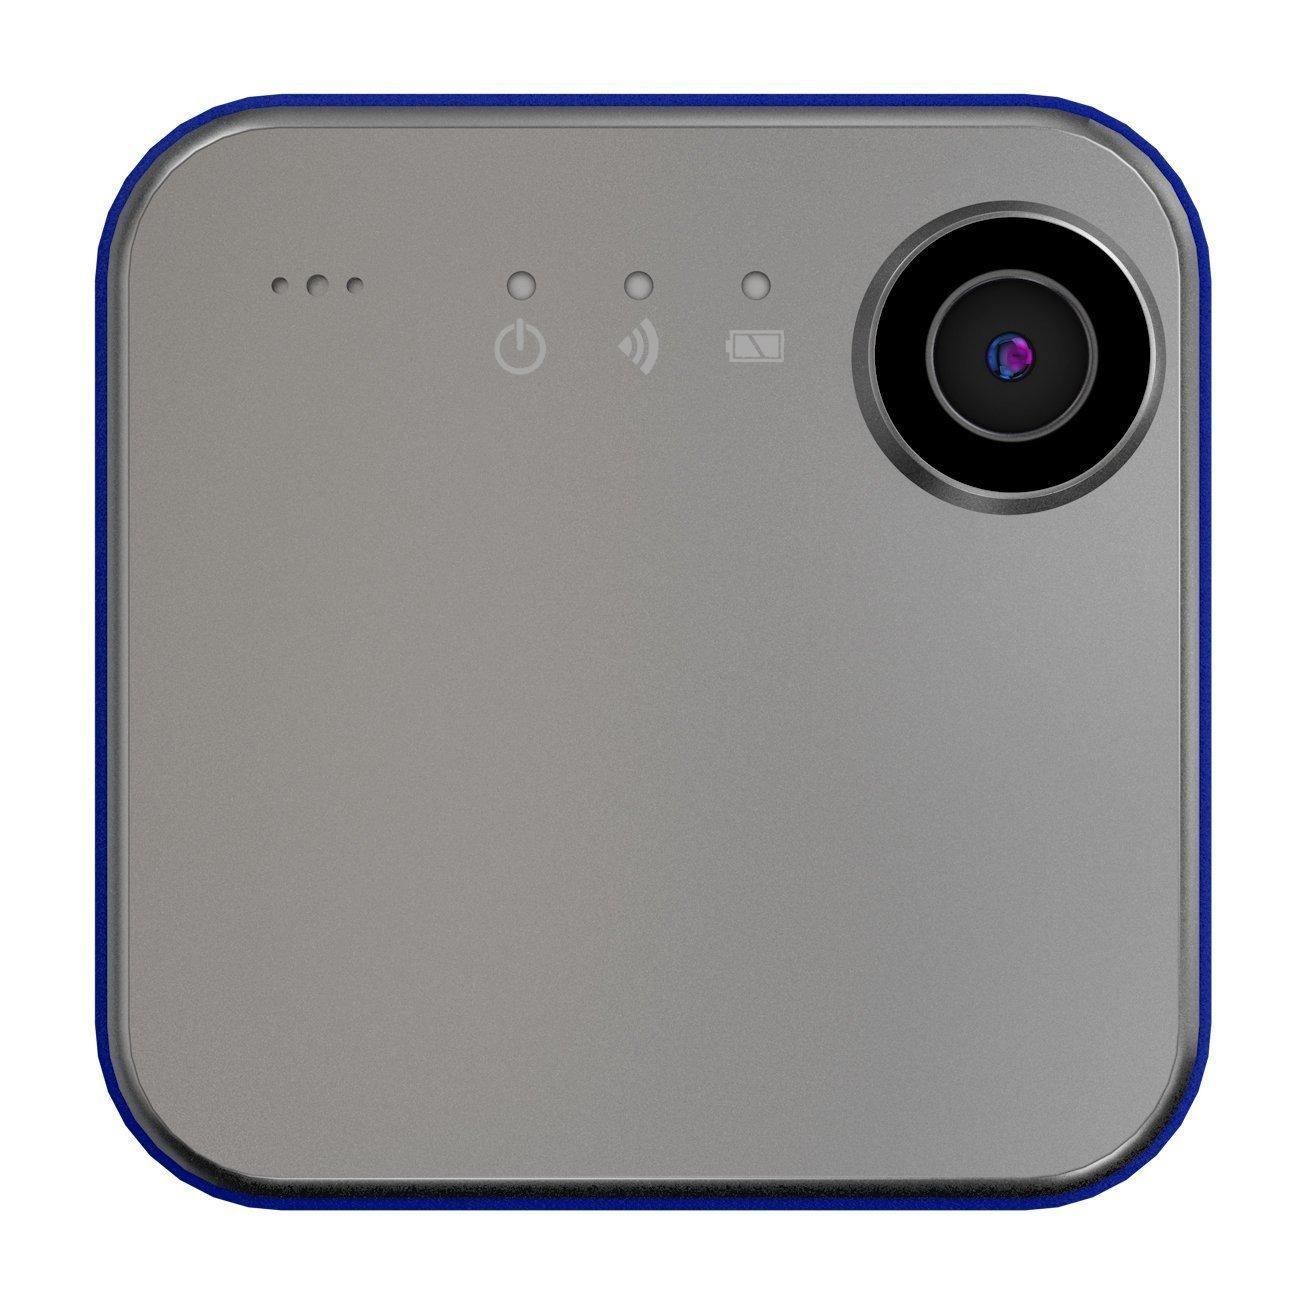 iON Camera SnapCam Wearable Bluetooth